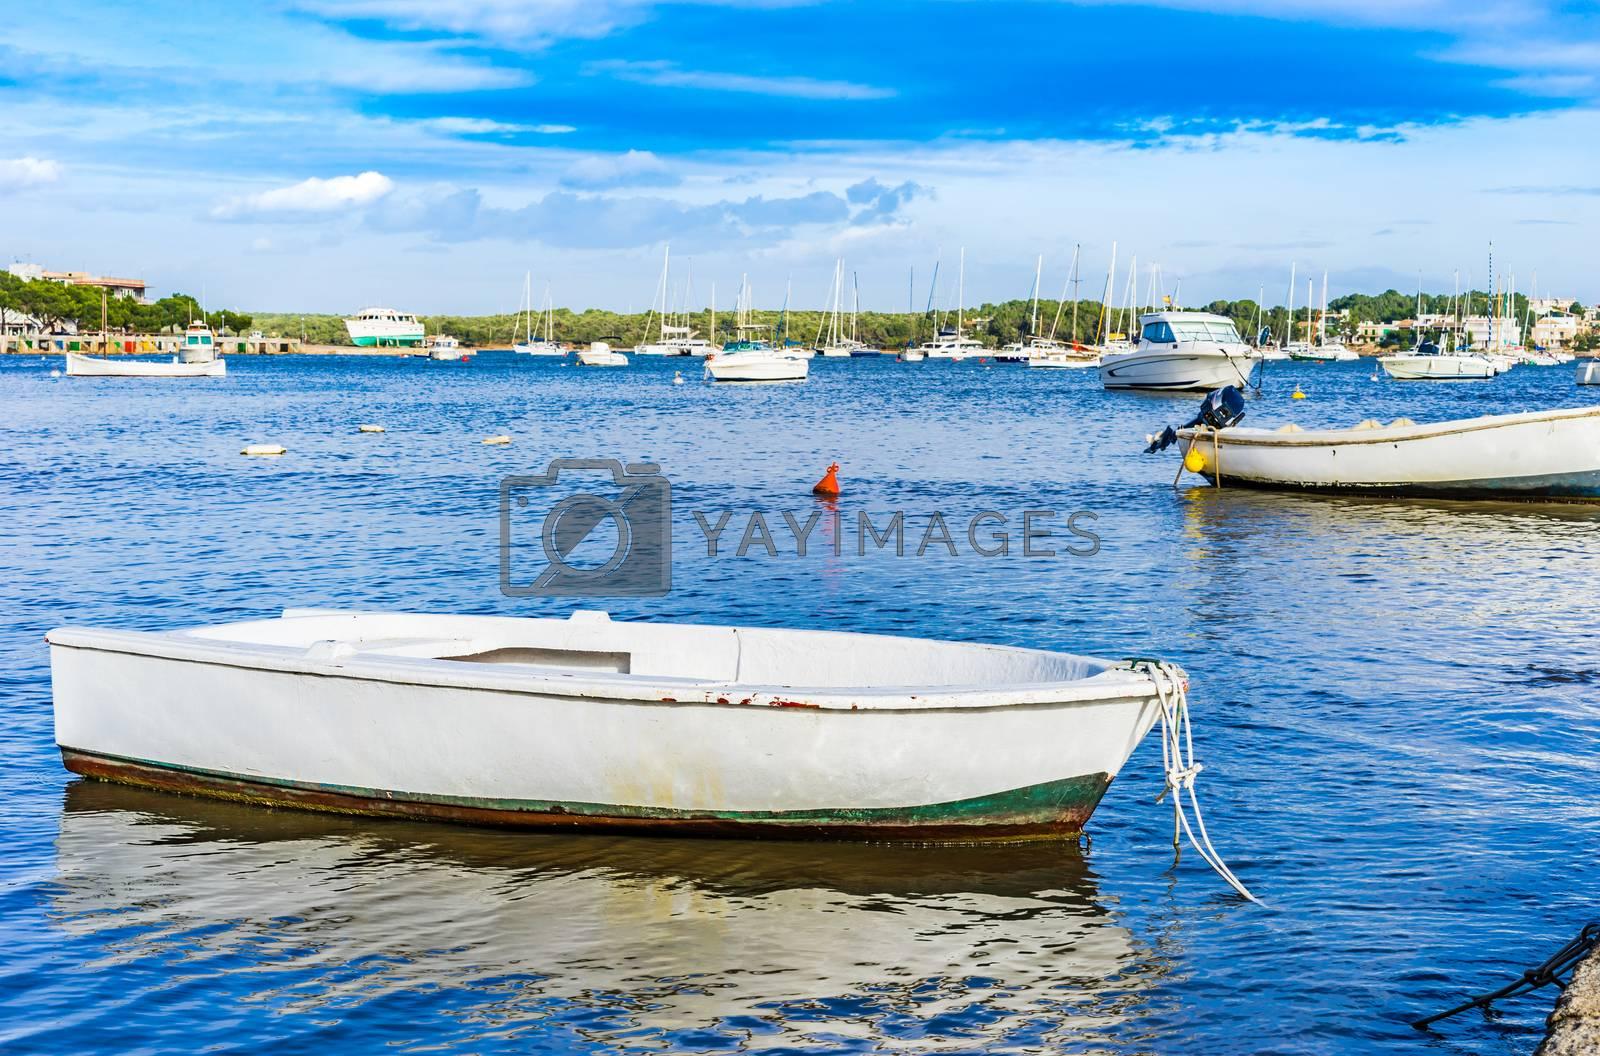 Spain Balearic islands, harbour of Portocolom, Mallorca Mediterranean Sea